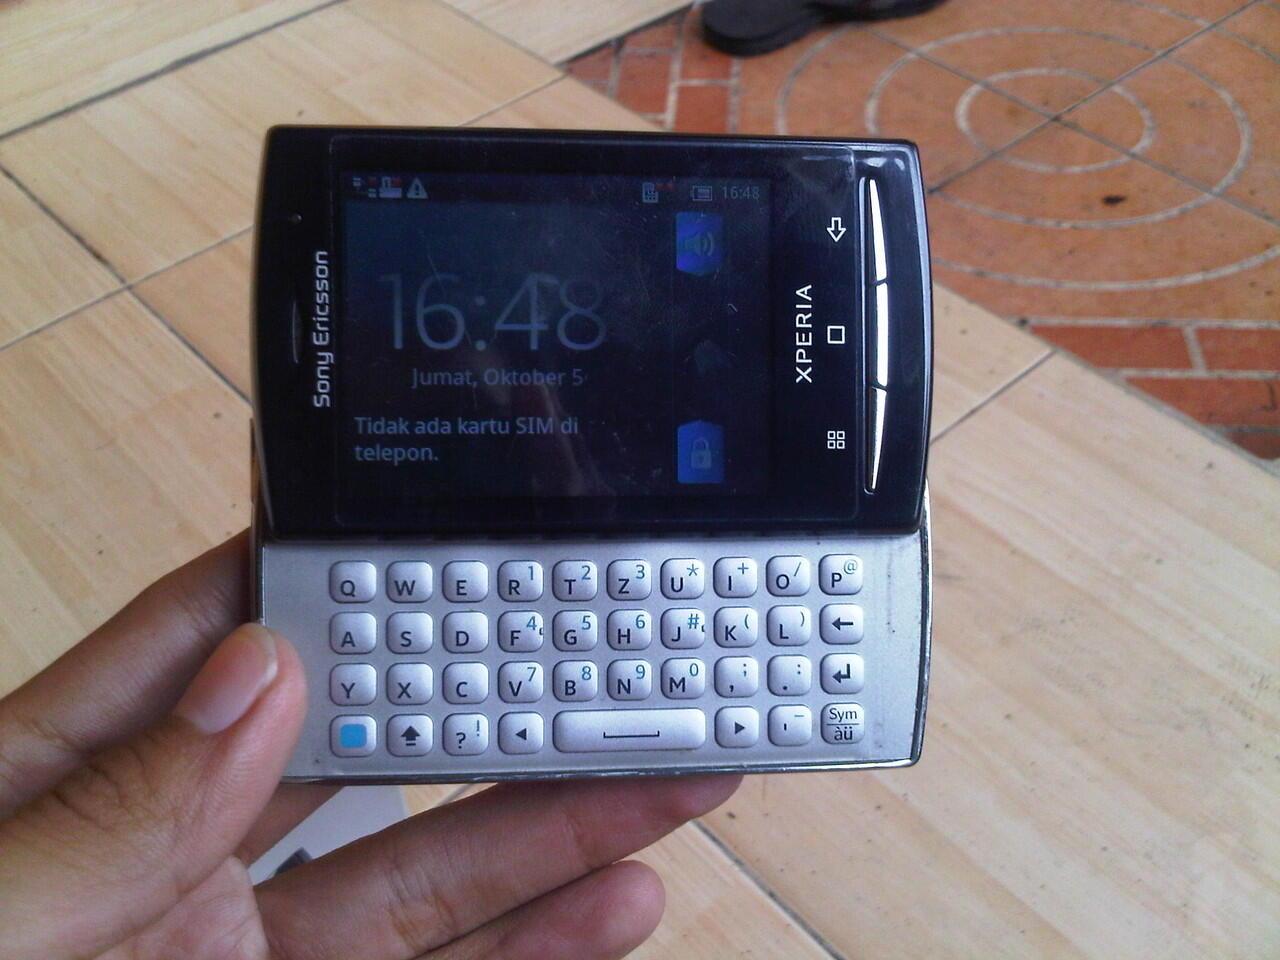 Jual Sony Ericsson Android Xperia X10 Mini Pro Murah